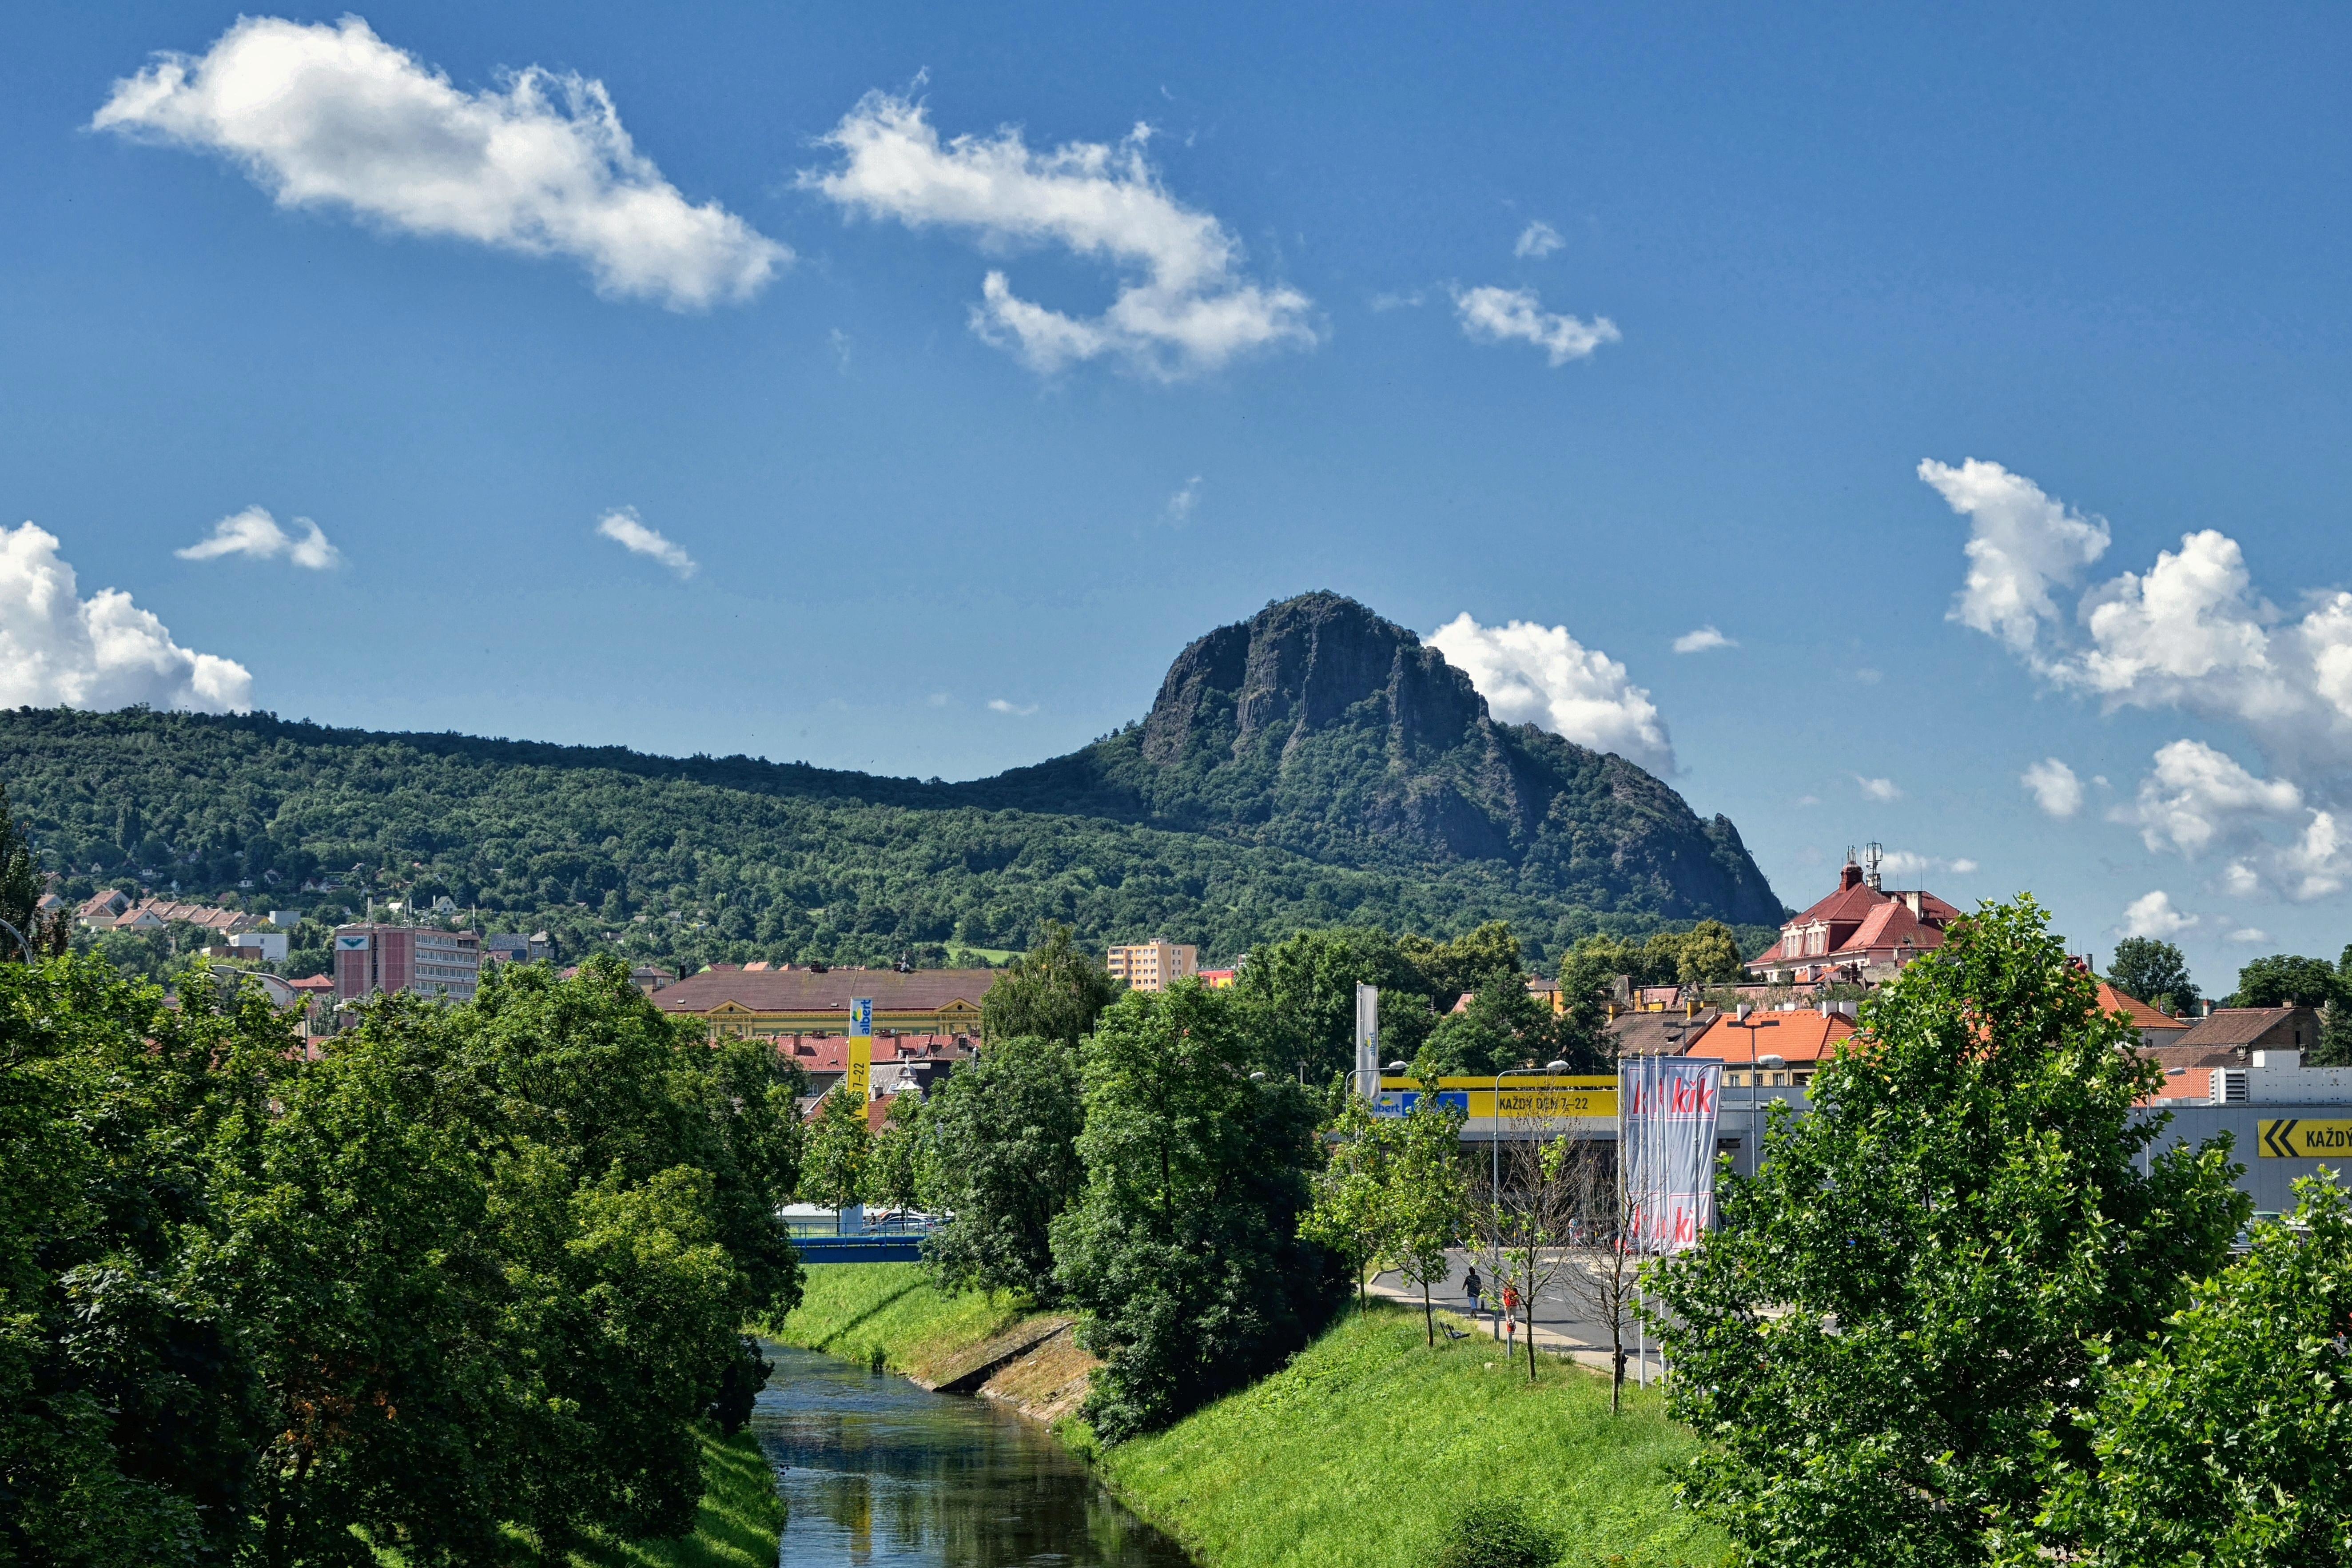 Gambar Pemandangan Horison Gunung Bukit Bunga Kota